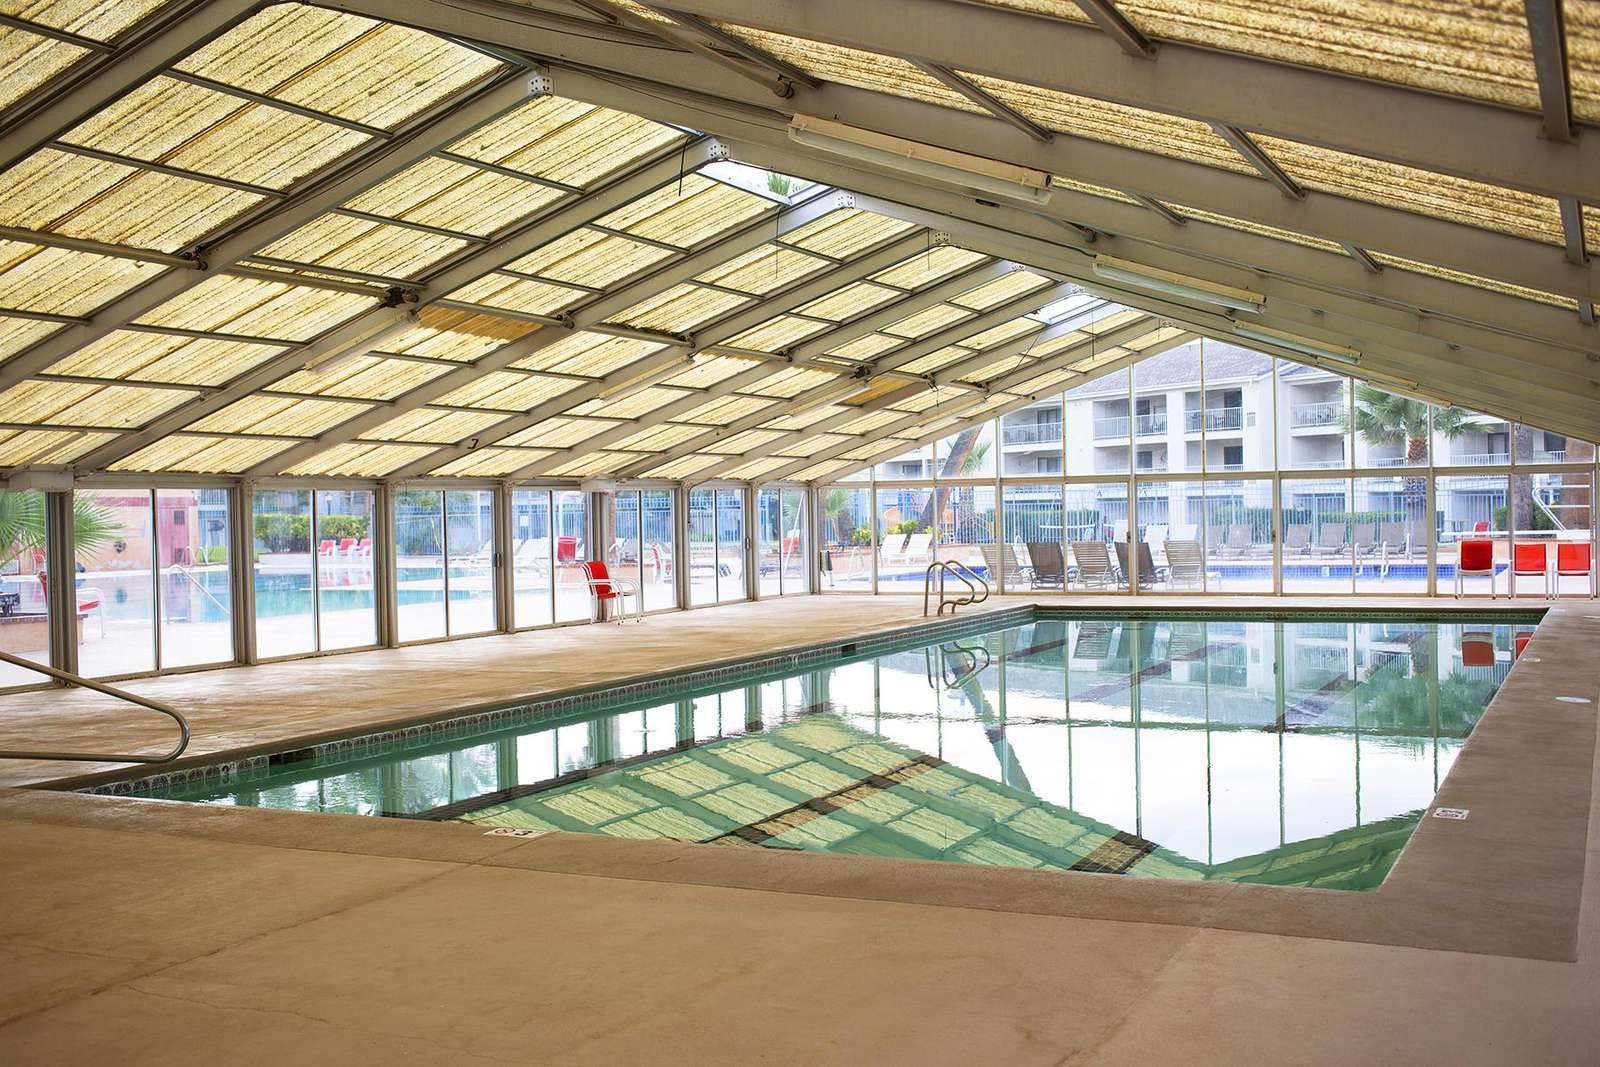 Indoor Pool - Heated Year Round